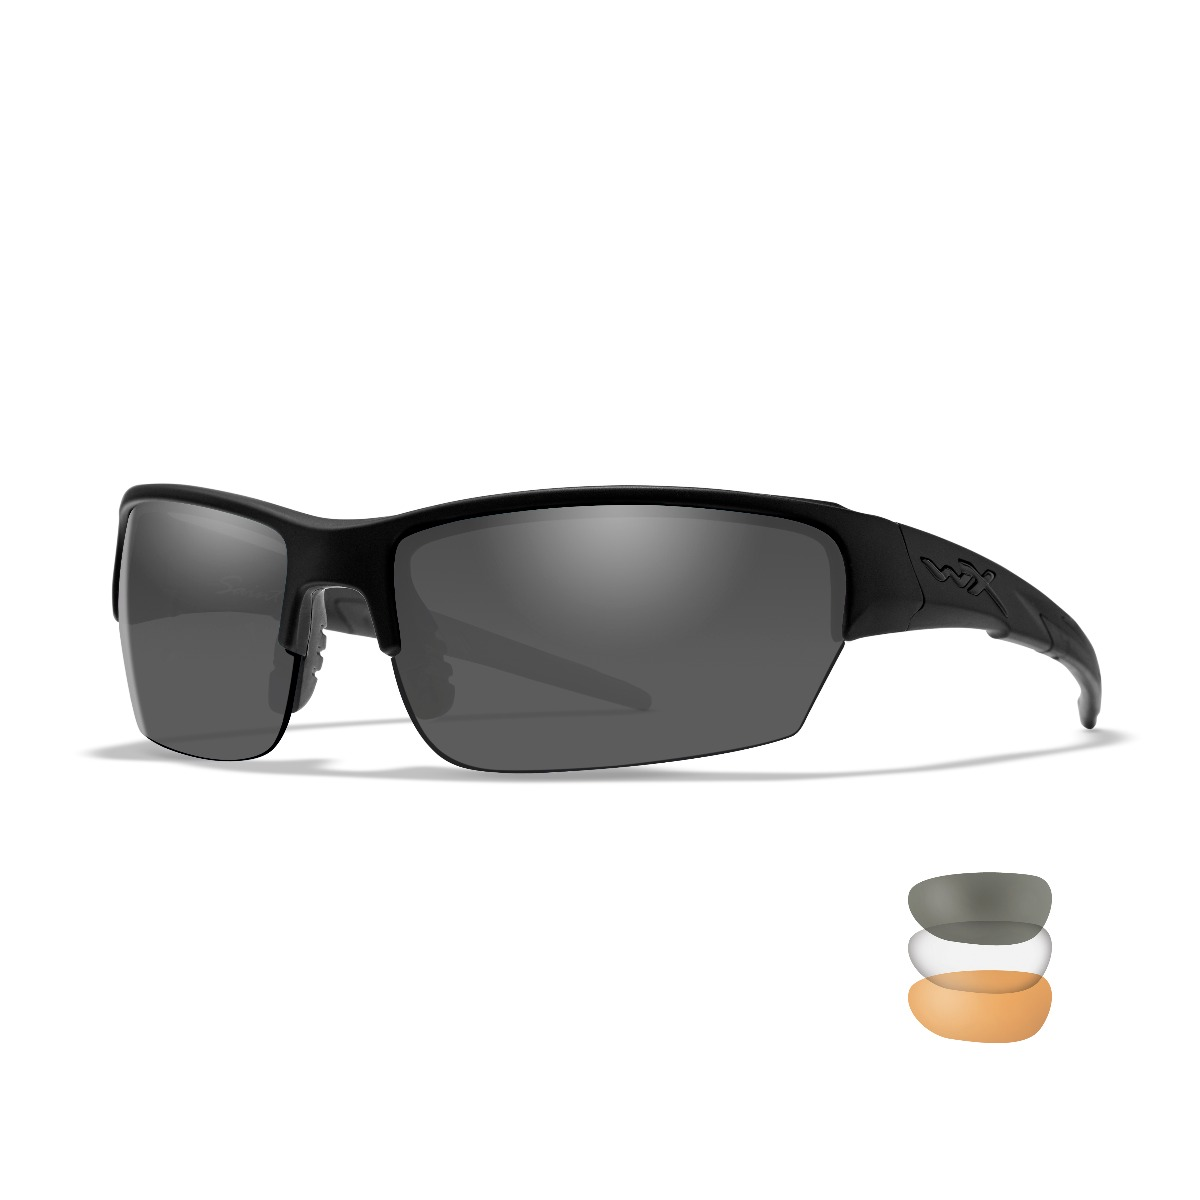 WILEY X WX Saint Sunglasses, 3 Lens Package, 1 Matte Black Frame w/Smoke Grey, Clear, Light Rust Lens